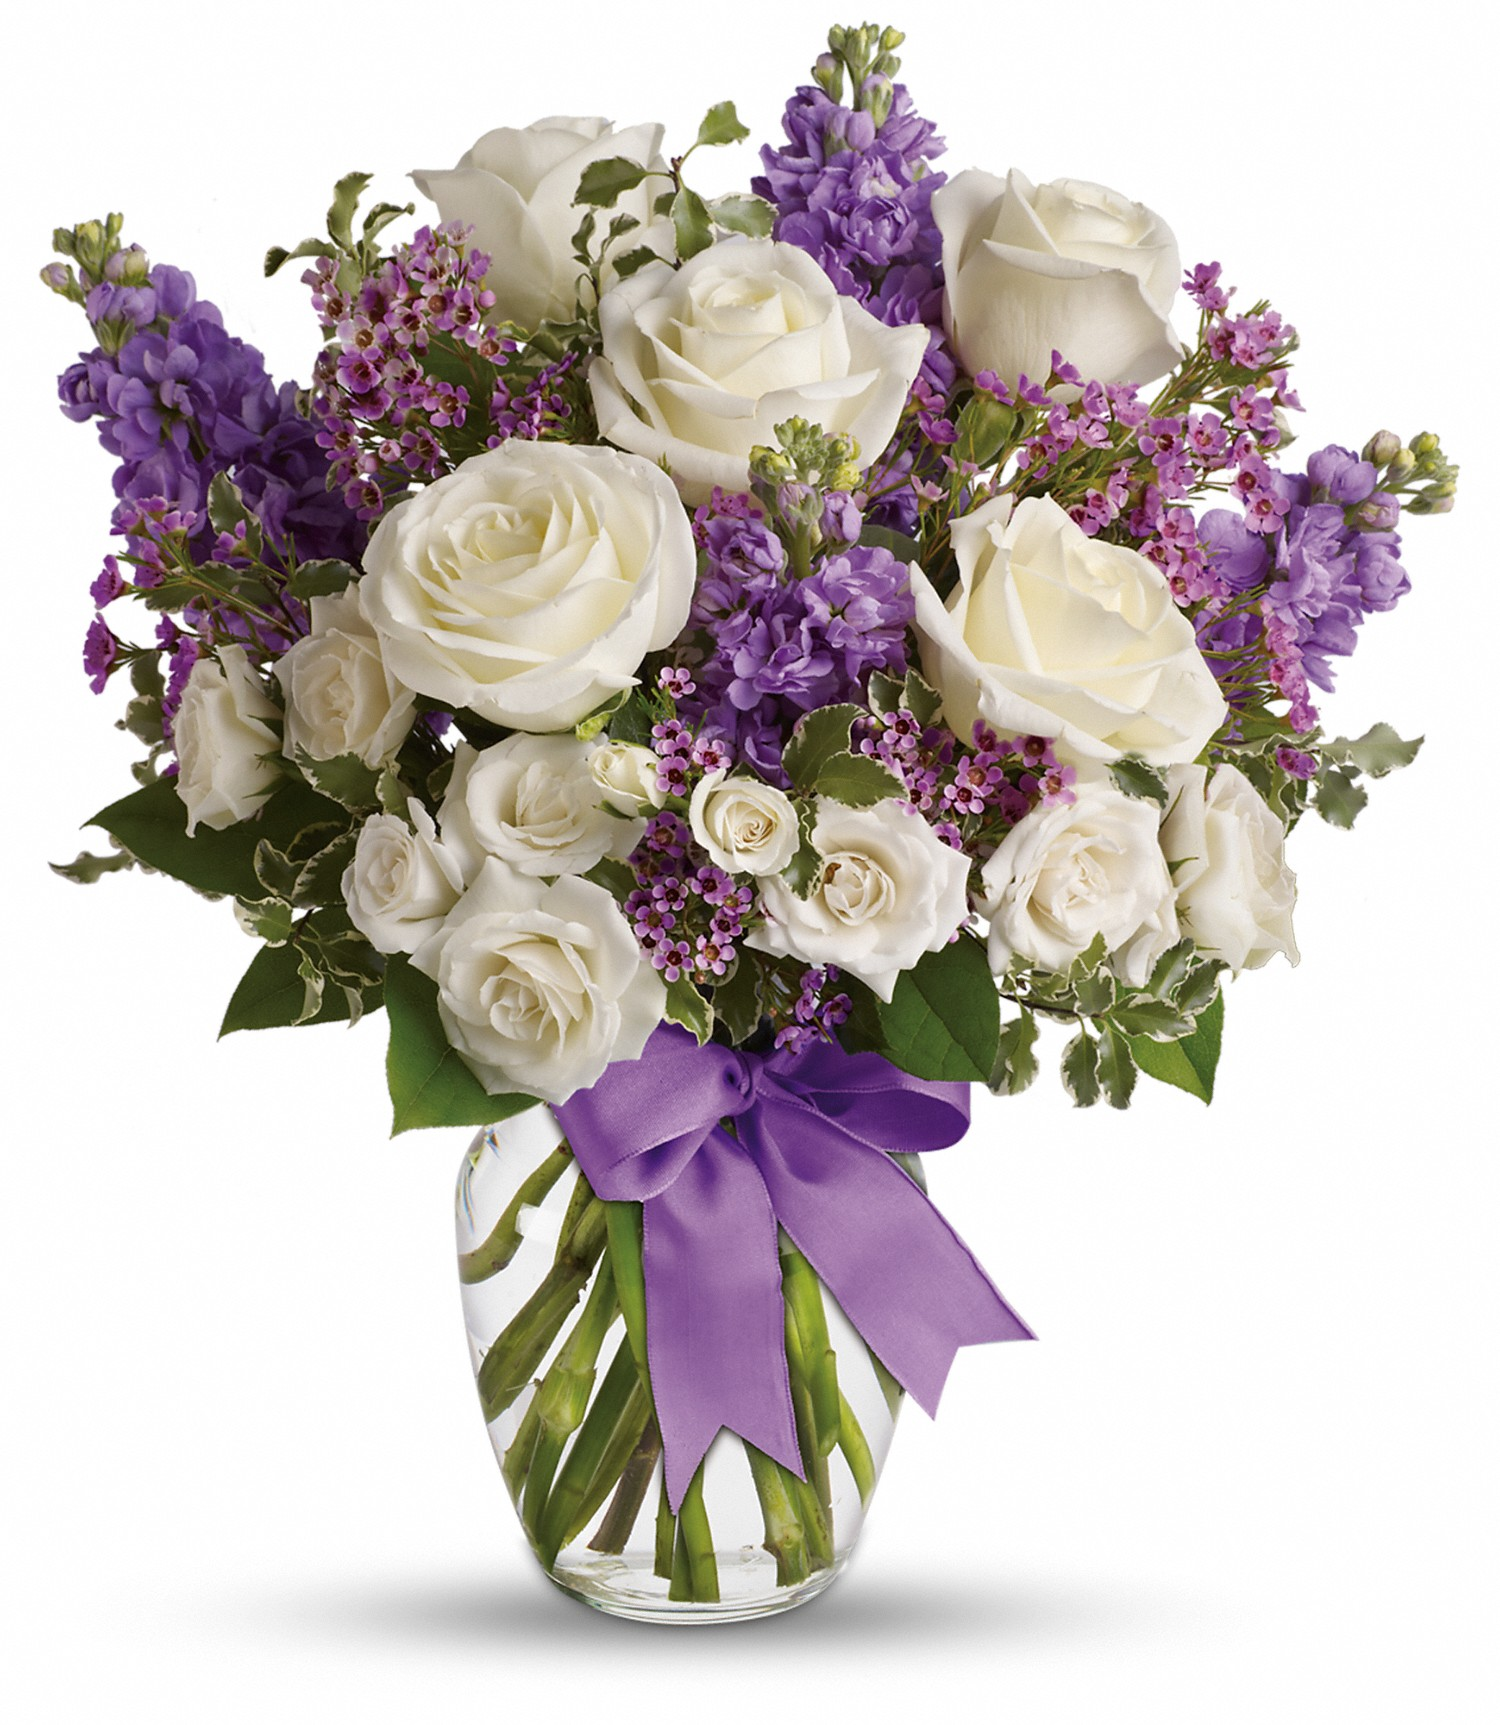 Standard Wedding Gift Amount: Everyday Flower Arrangements: Teleflora's Enchanted Cottage